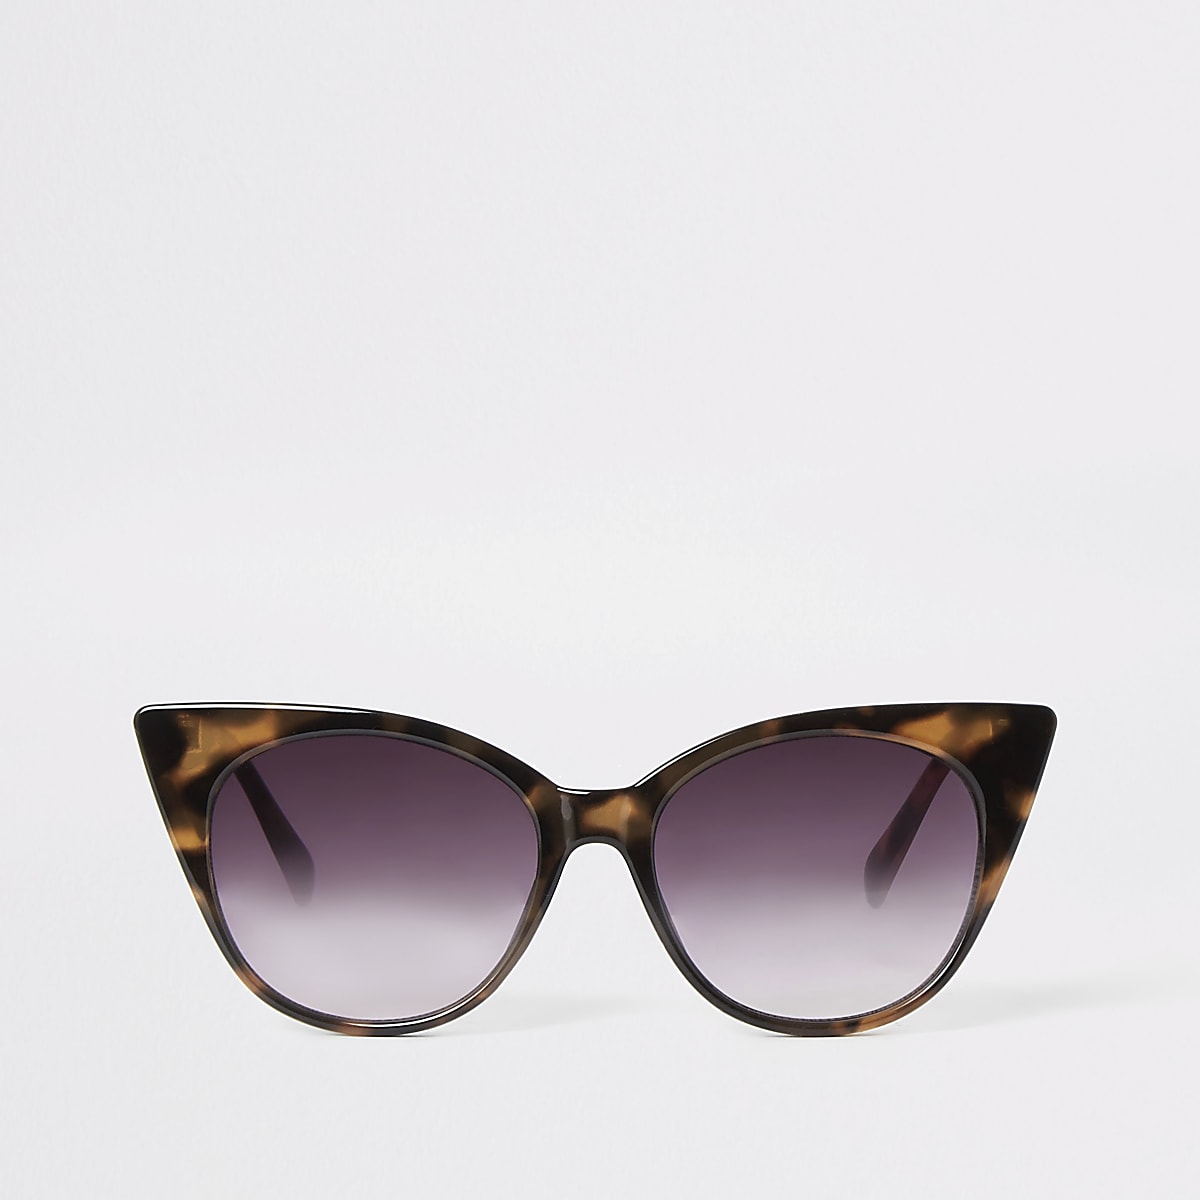 Brown tortoise cat eye sunglasses